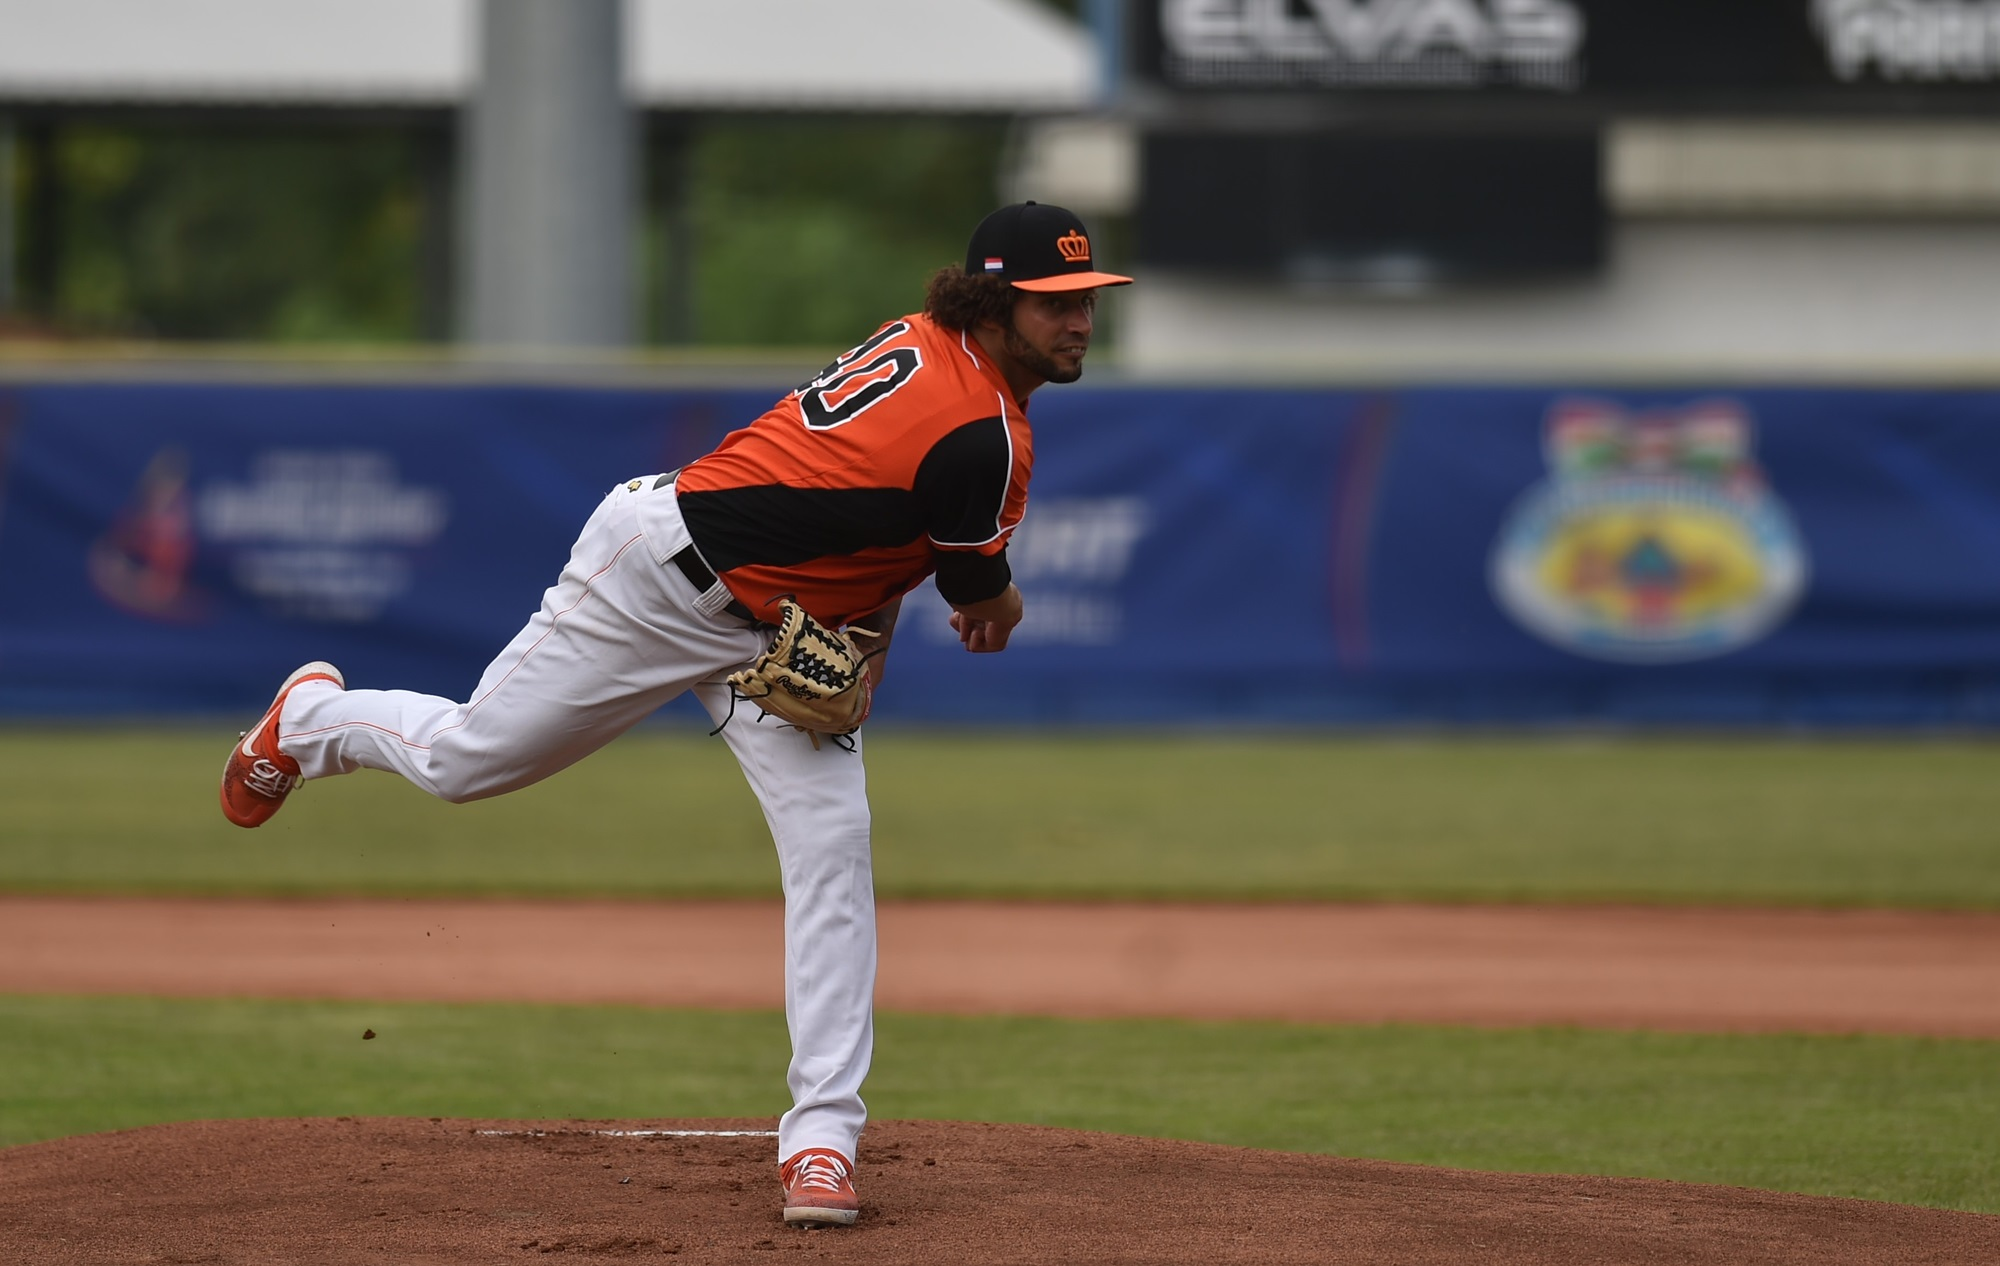 Orlando Yintema went eight innings for The Netherlands